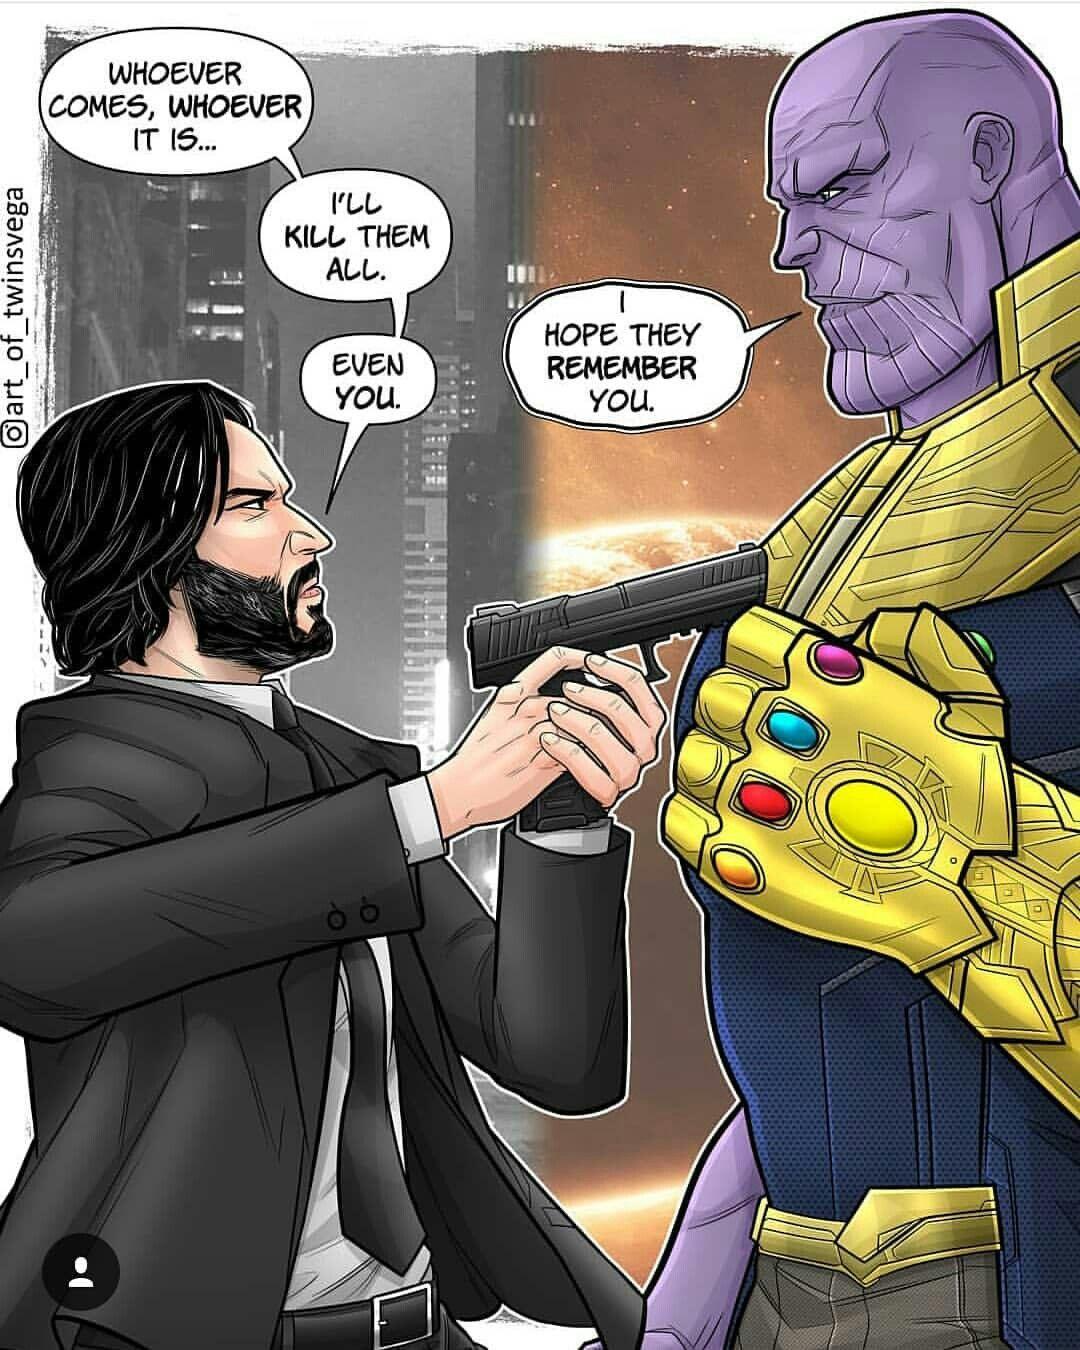 Pin By Rishi Chandran On Keanu John Wick Meme Funny Marvel Memes Marvel Jokes